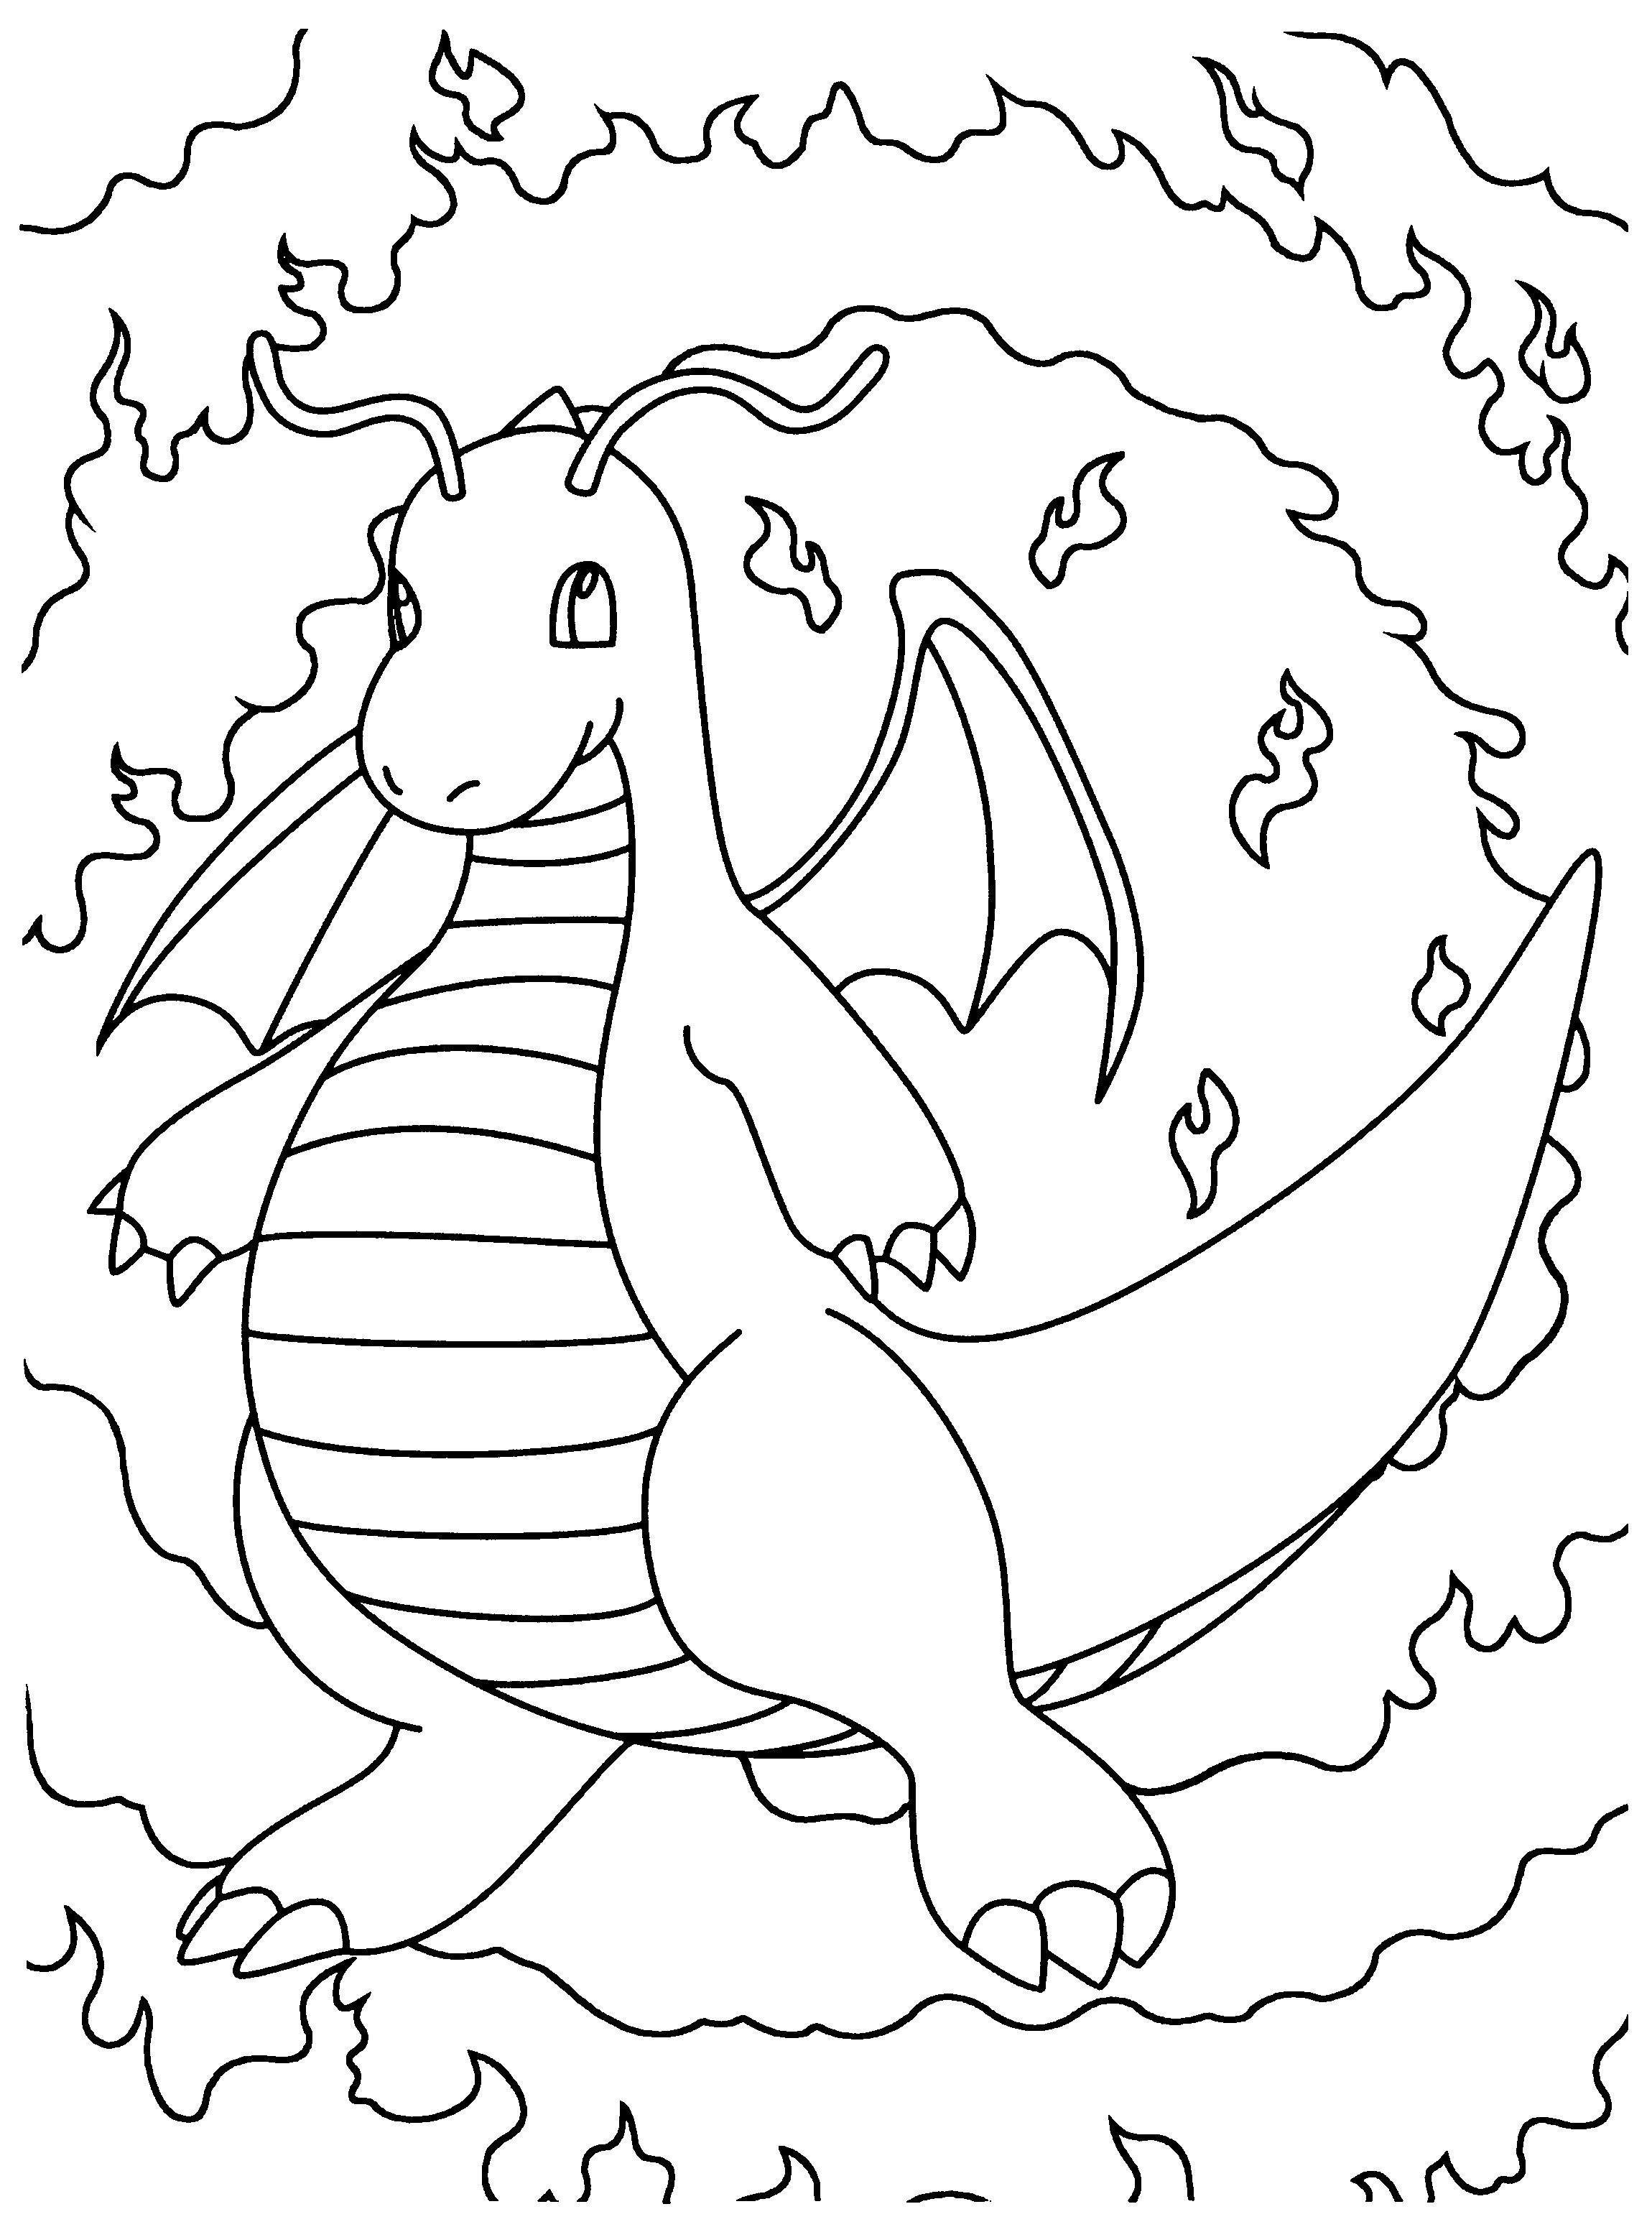 Kleurplaat Dragonite Kleurplaten Kleurboek Pokemon